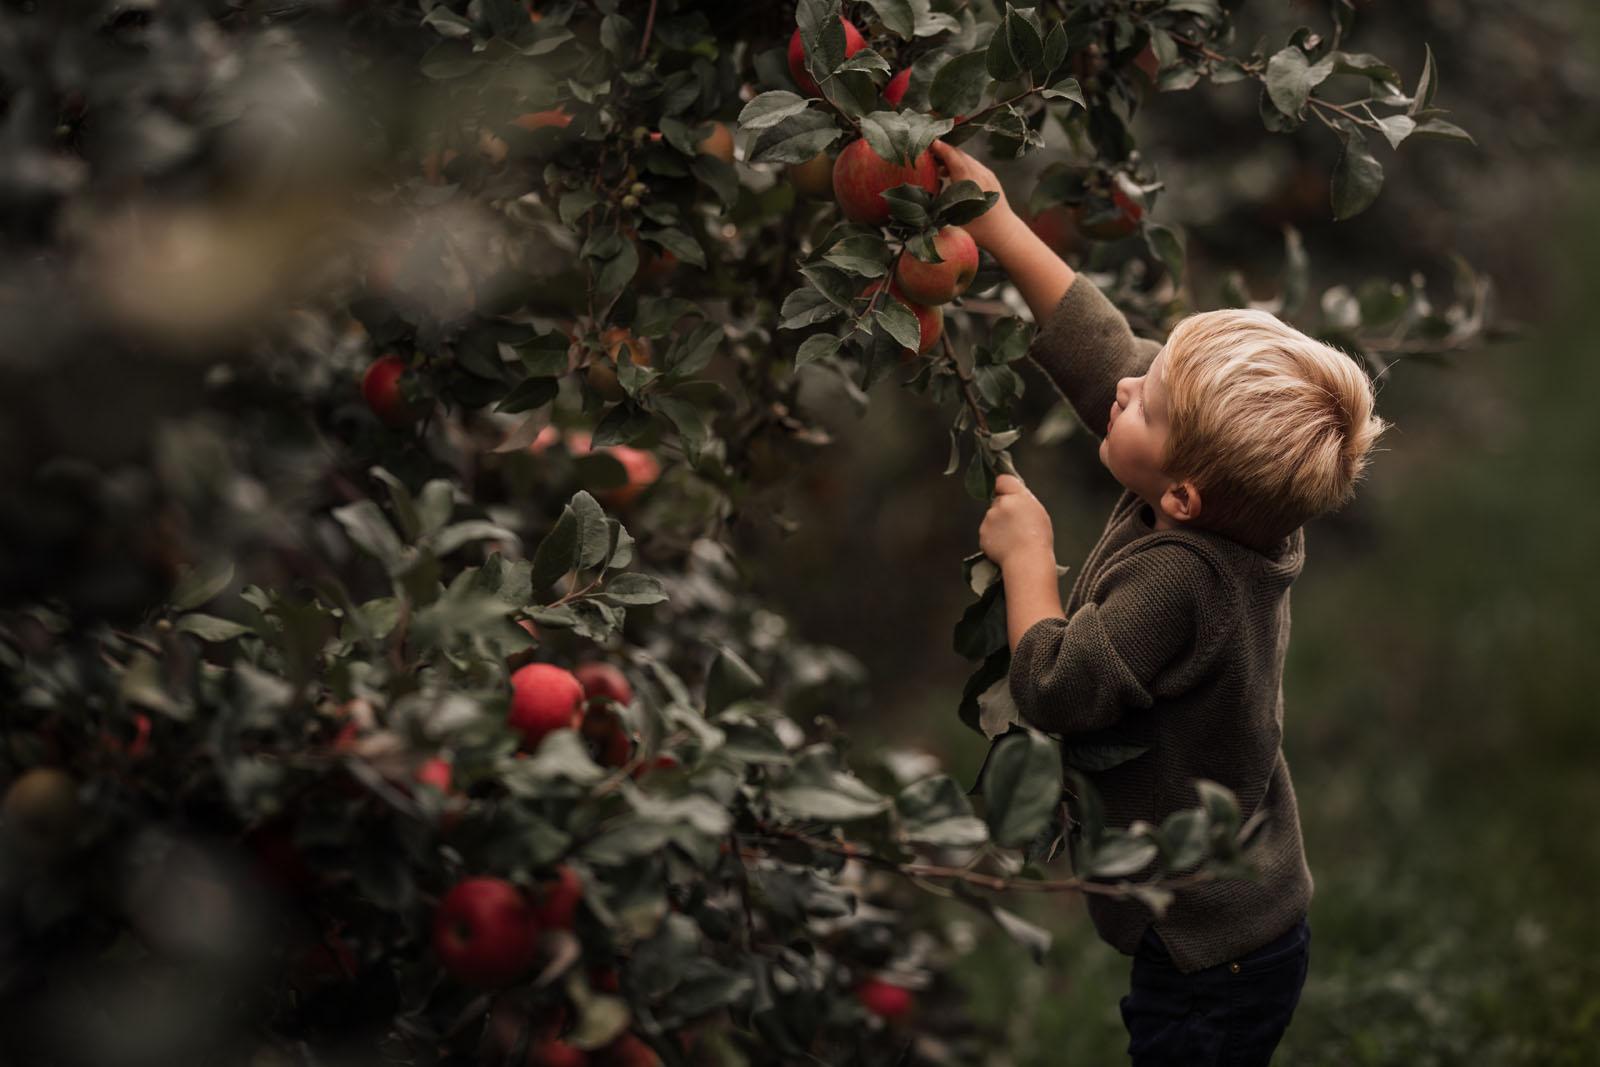 megloeks_image23 child picking apples from tree fall activities by meg loeks